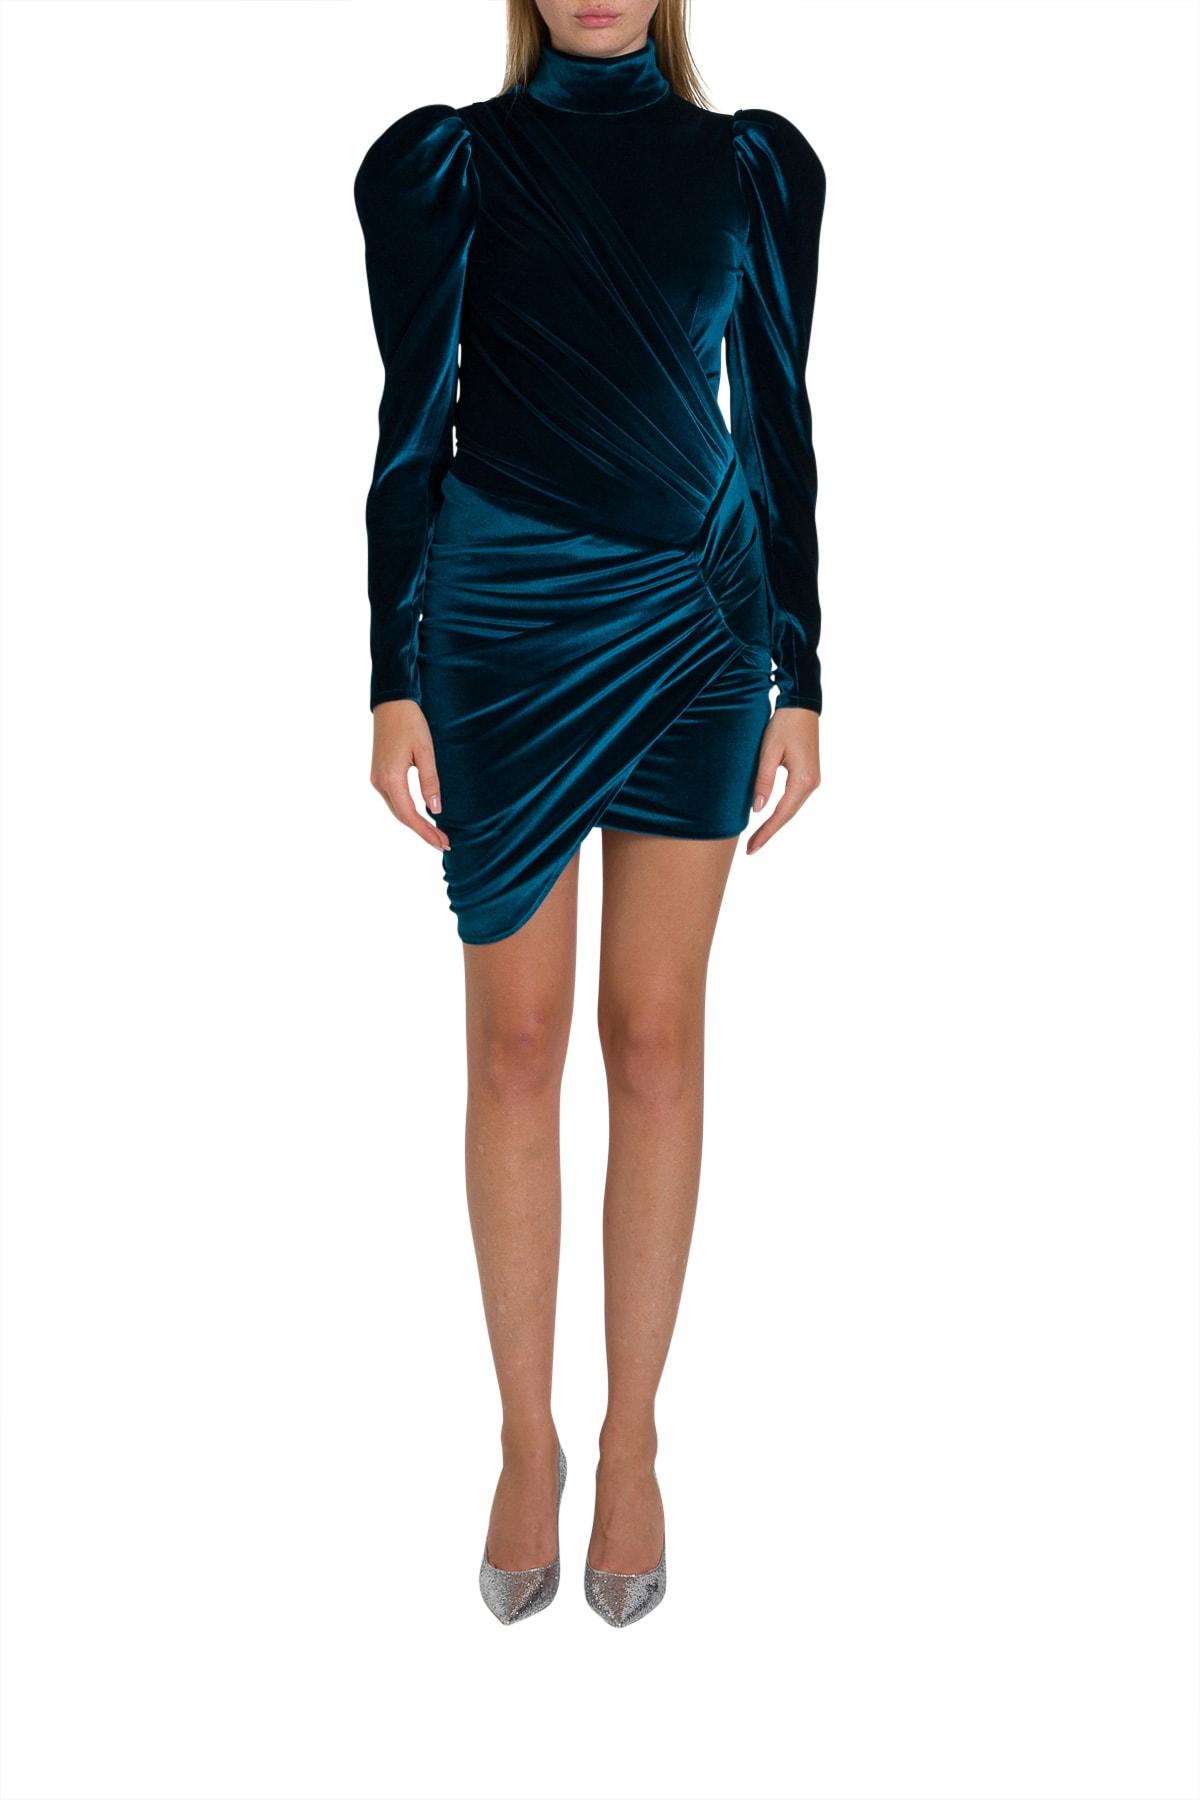 Photo of  Alexandre Vauthier Short Velvet Dress With Puffed Sleeve- shop Alexandre Vauthier  online sales